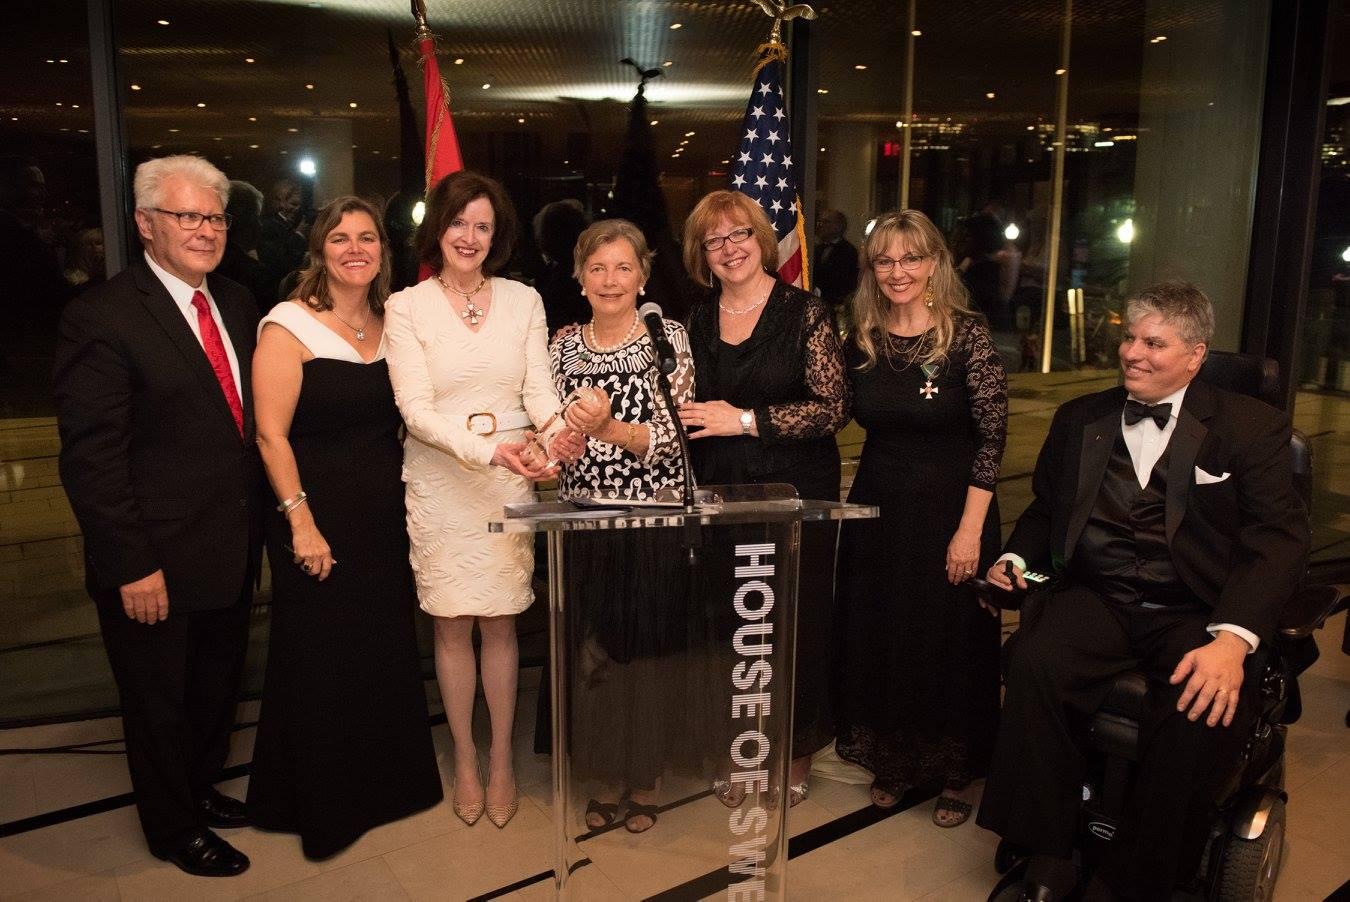 Award ceremony (from left to right):Mr. Stefan Fedor, Mrs. Andrea Lauer Rice, Ambassador April H. Foley, Mrs. Edith K. Lauer, Dr. Ágnes Virga, Mrs. Csilla Grauzer, Mr. Max Teleki